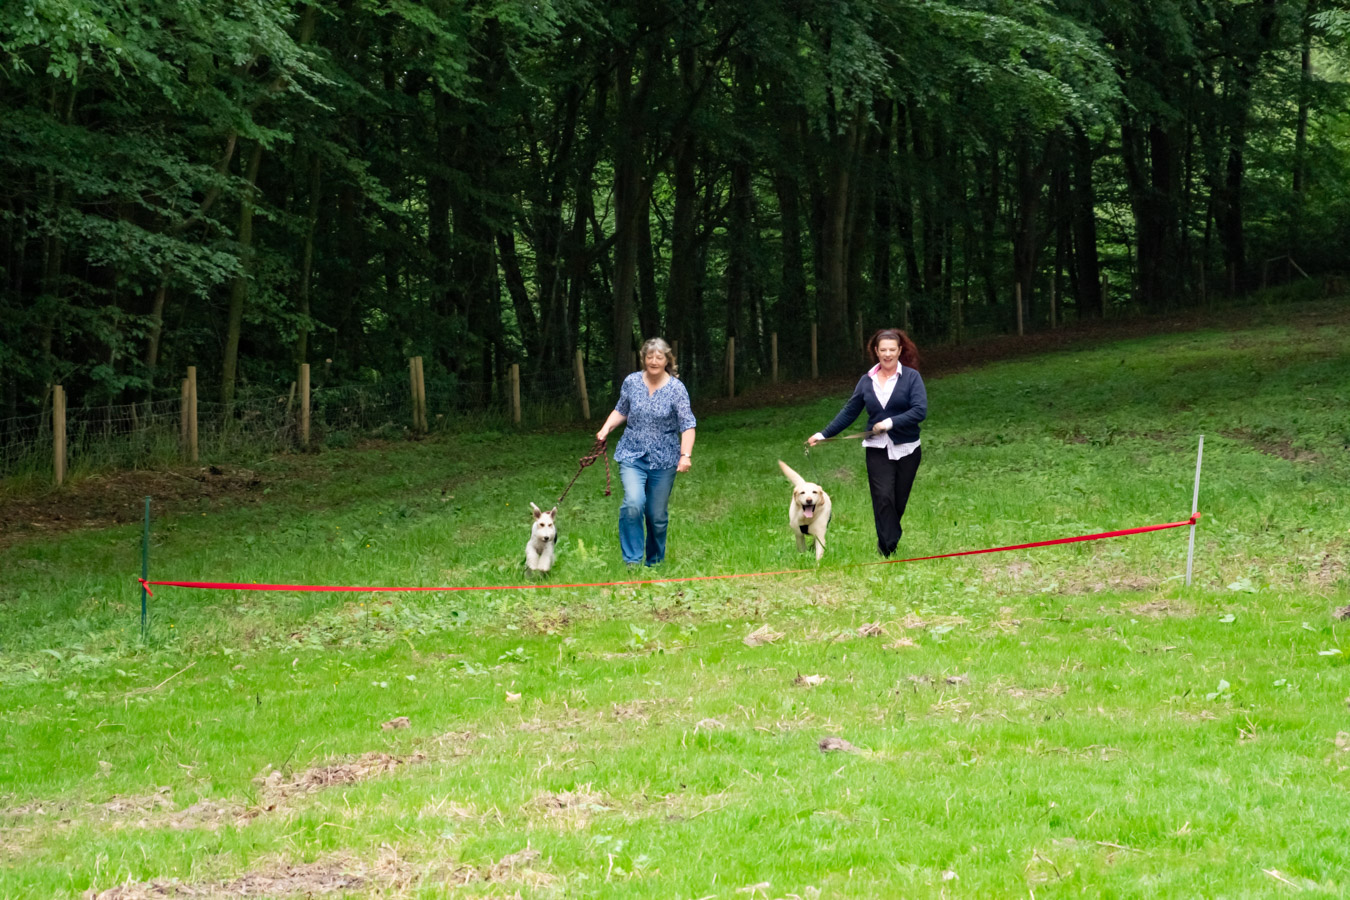 Monkton-Wyld-Best-Camping-Caravanning-West-Dorset-Dog-Friendly-Walk-4